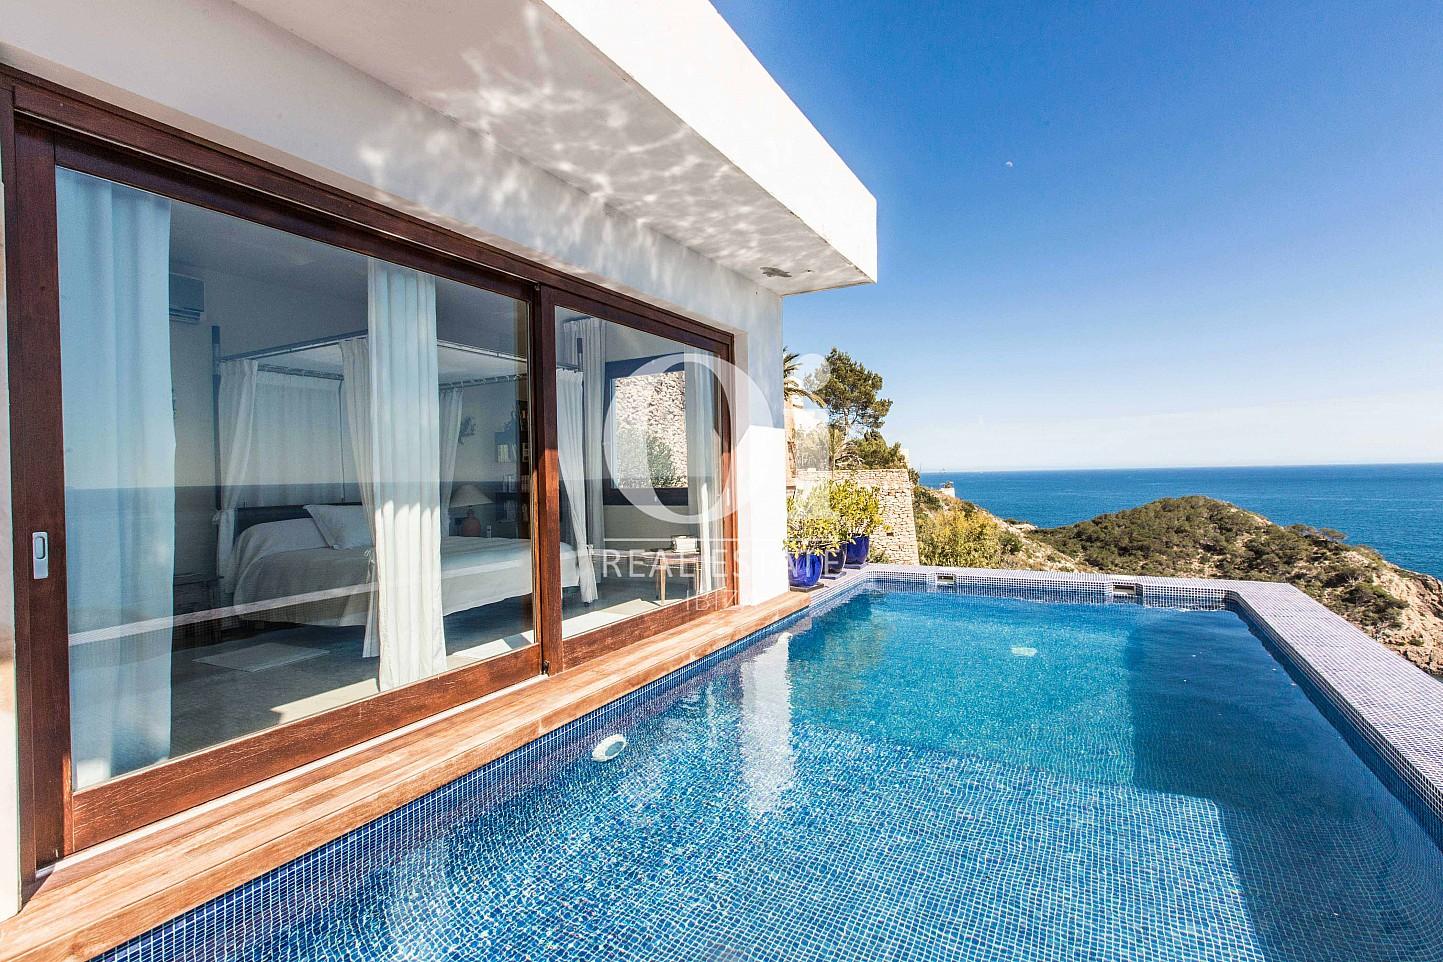 Piscina  de casa de alquiler de estancia en Roca Llisa, Ibiza